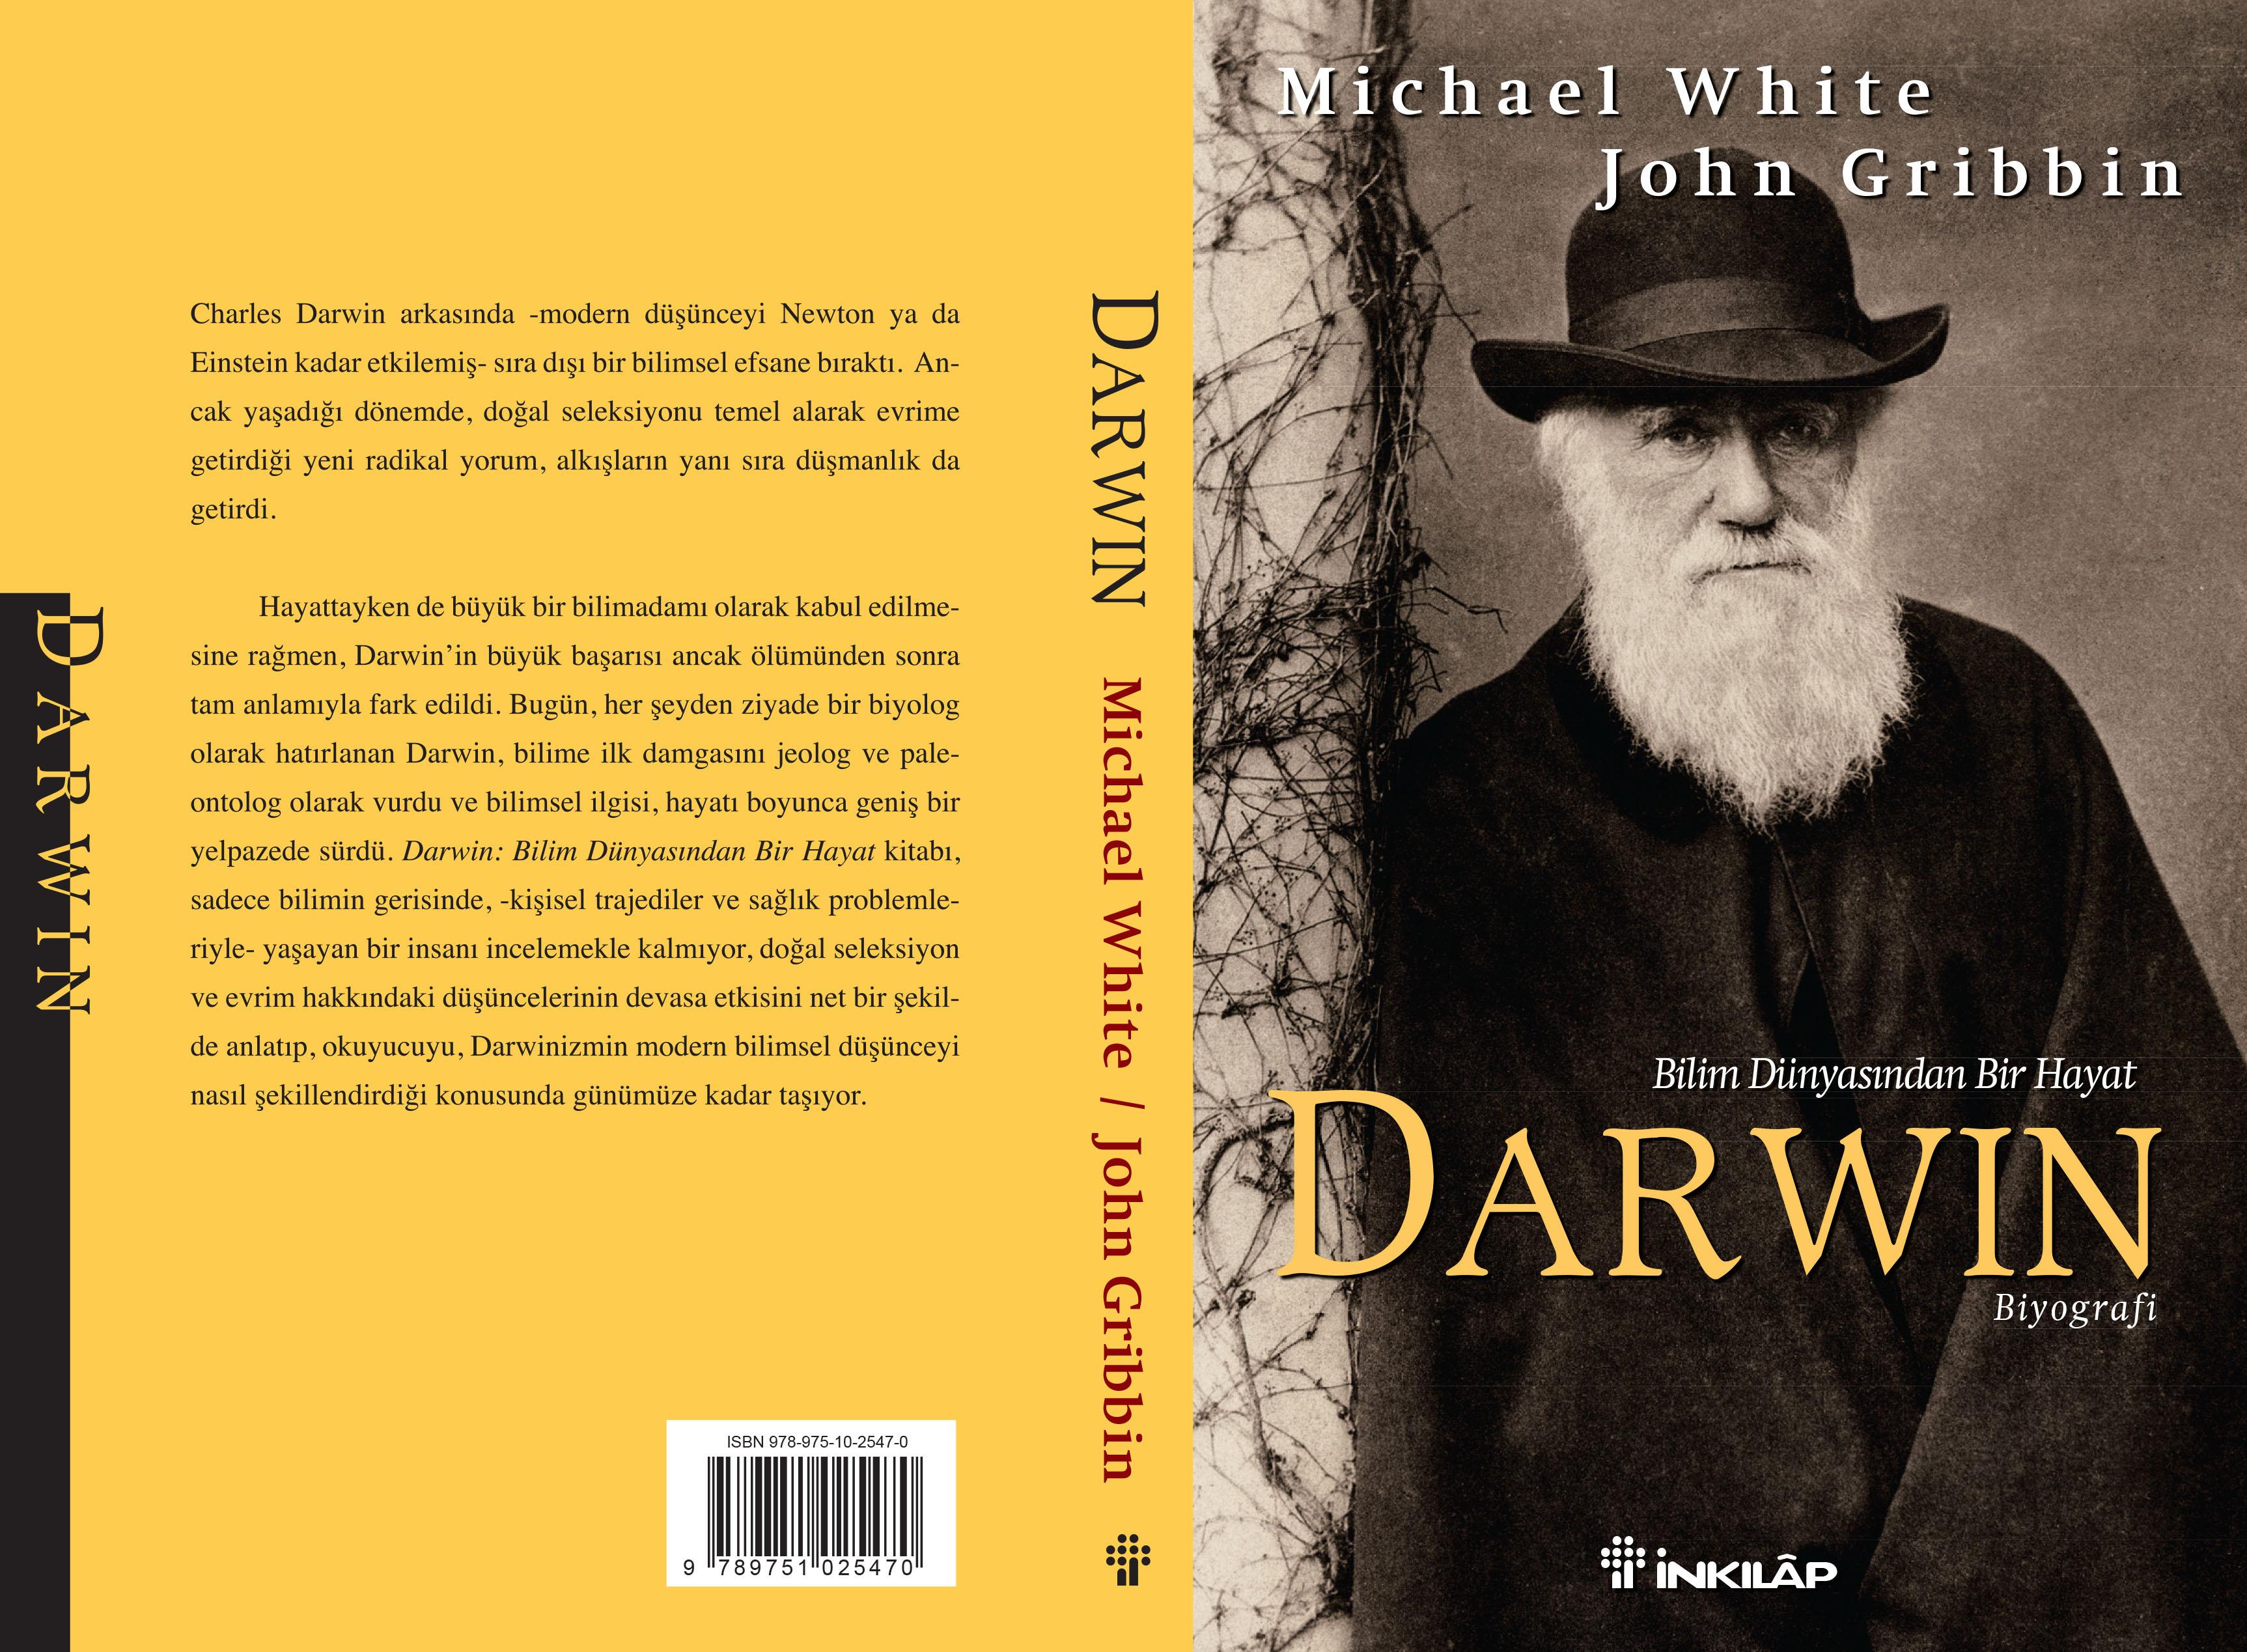 Book Cover Design For Autobiography : Sayat ayık darwin biography book cover design